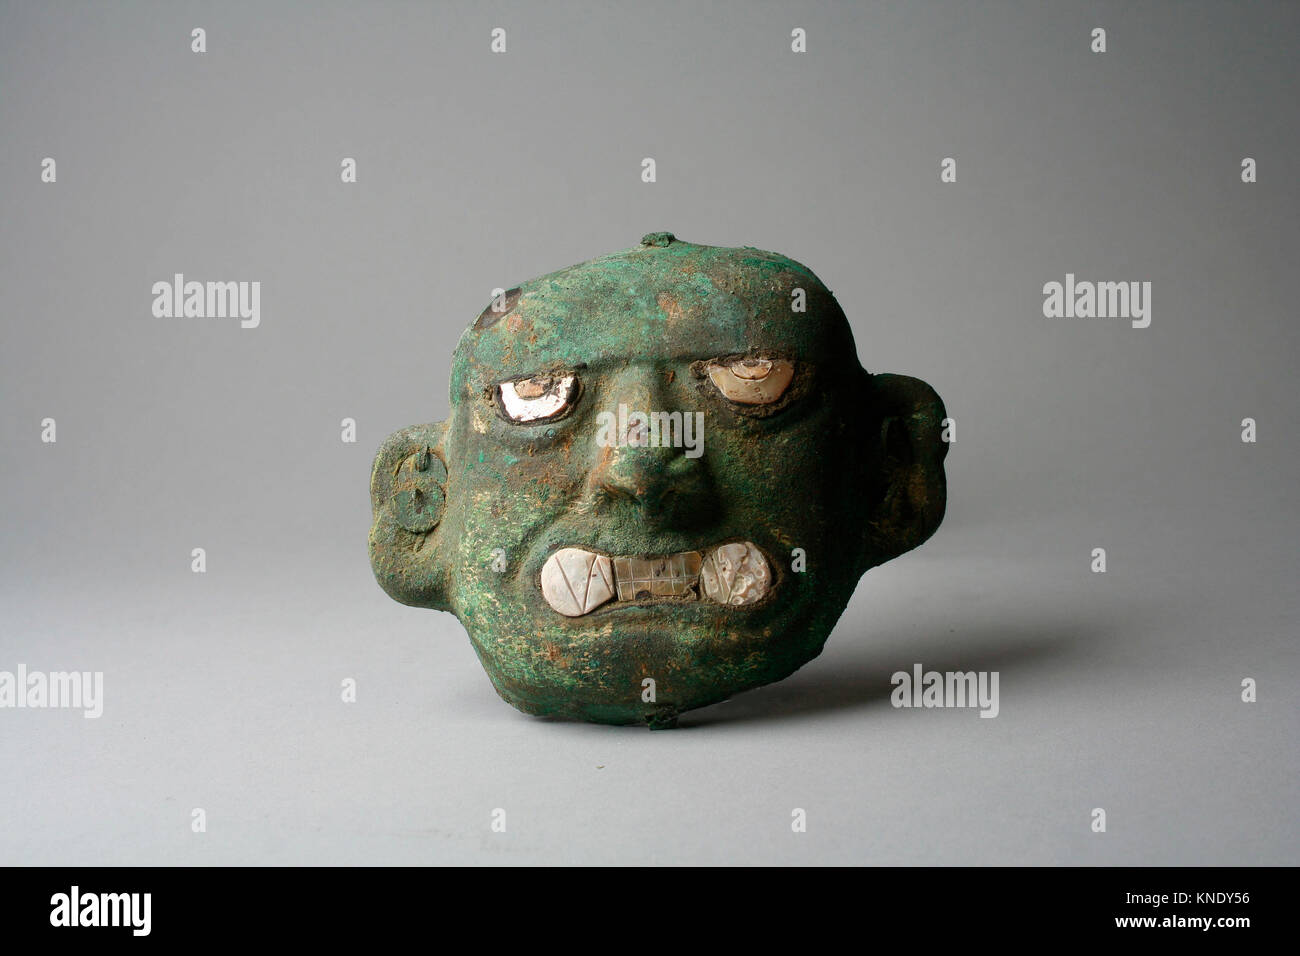 Face Mask Ornament. Date: 390-450; Geography: Peru; Culture: Moche (Loma Negra); Medium: Silvered copper, shell; - Stock Image